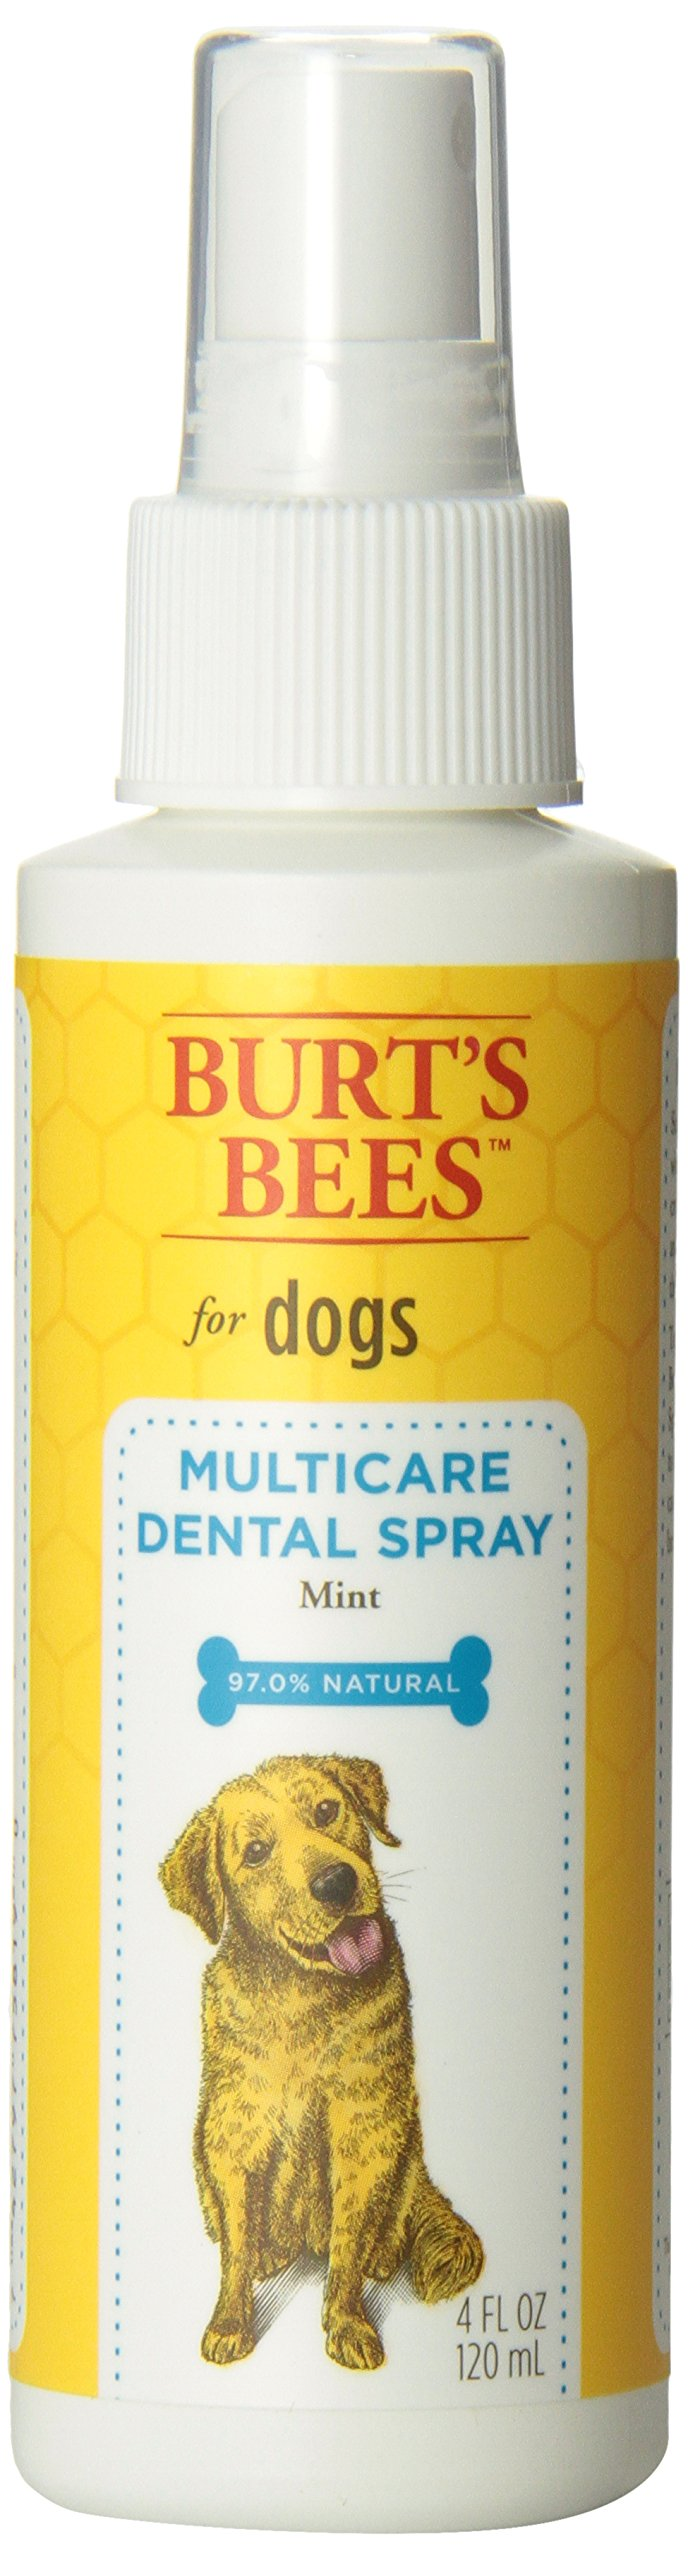 Burt's Bees for Dogs Multicare Dental Spray, 4 oz.